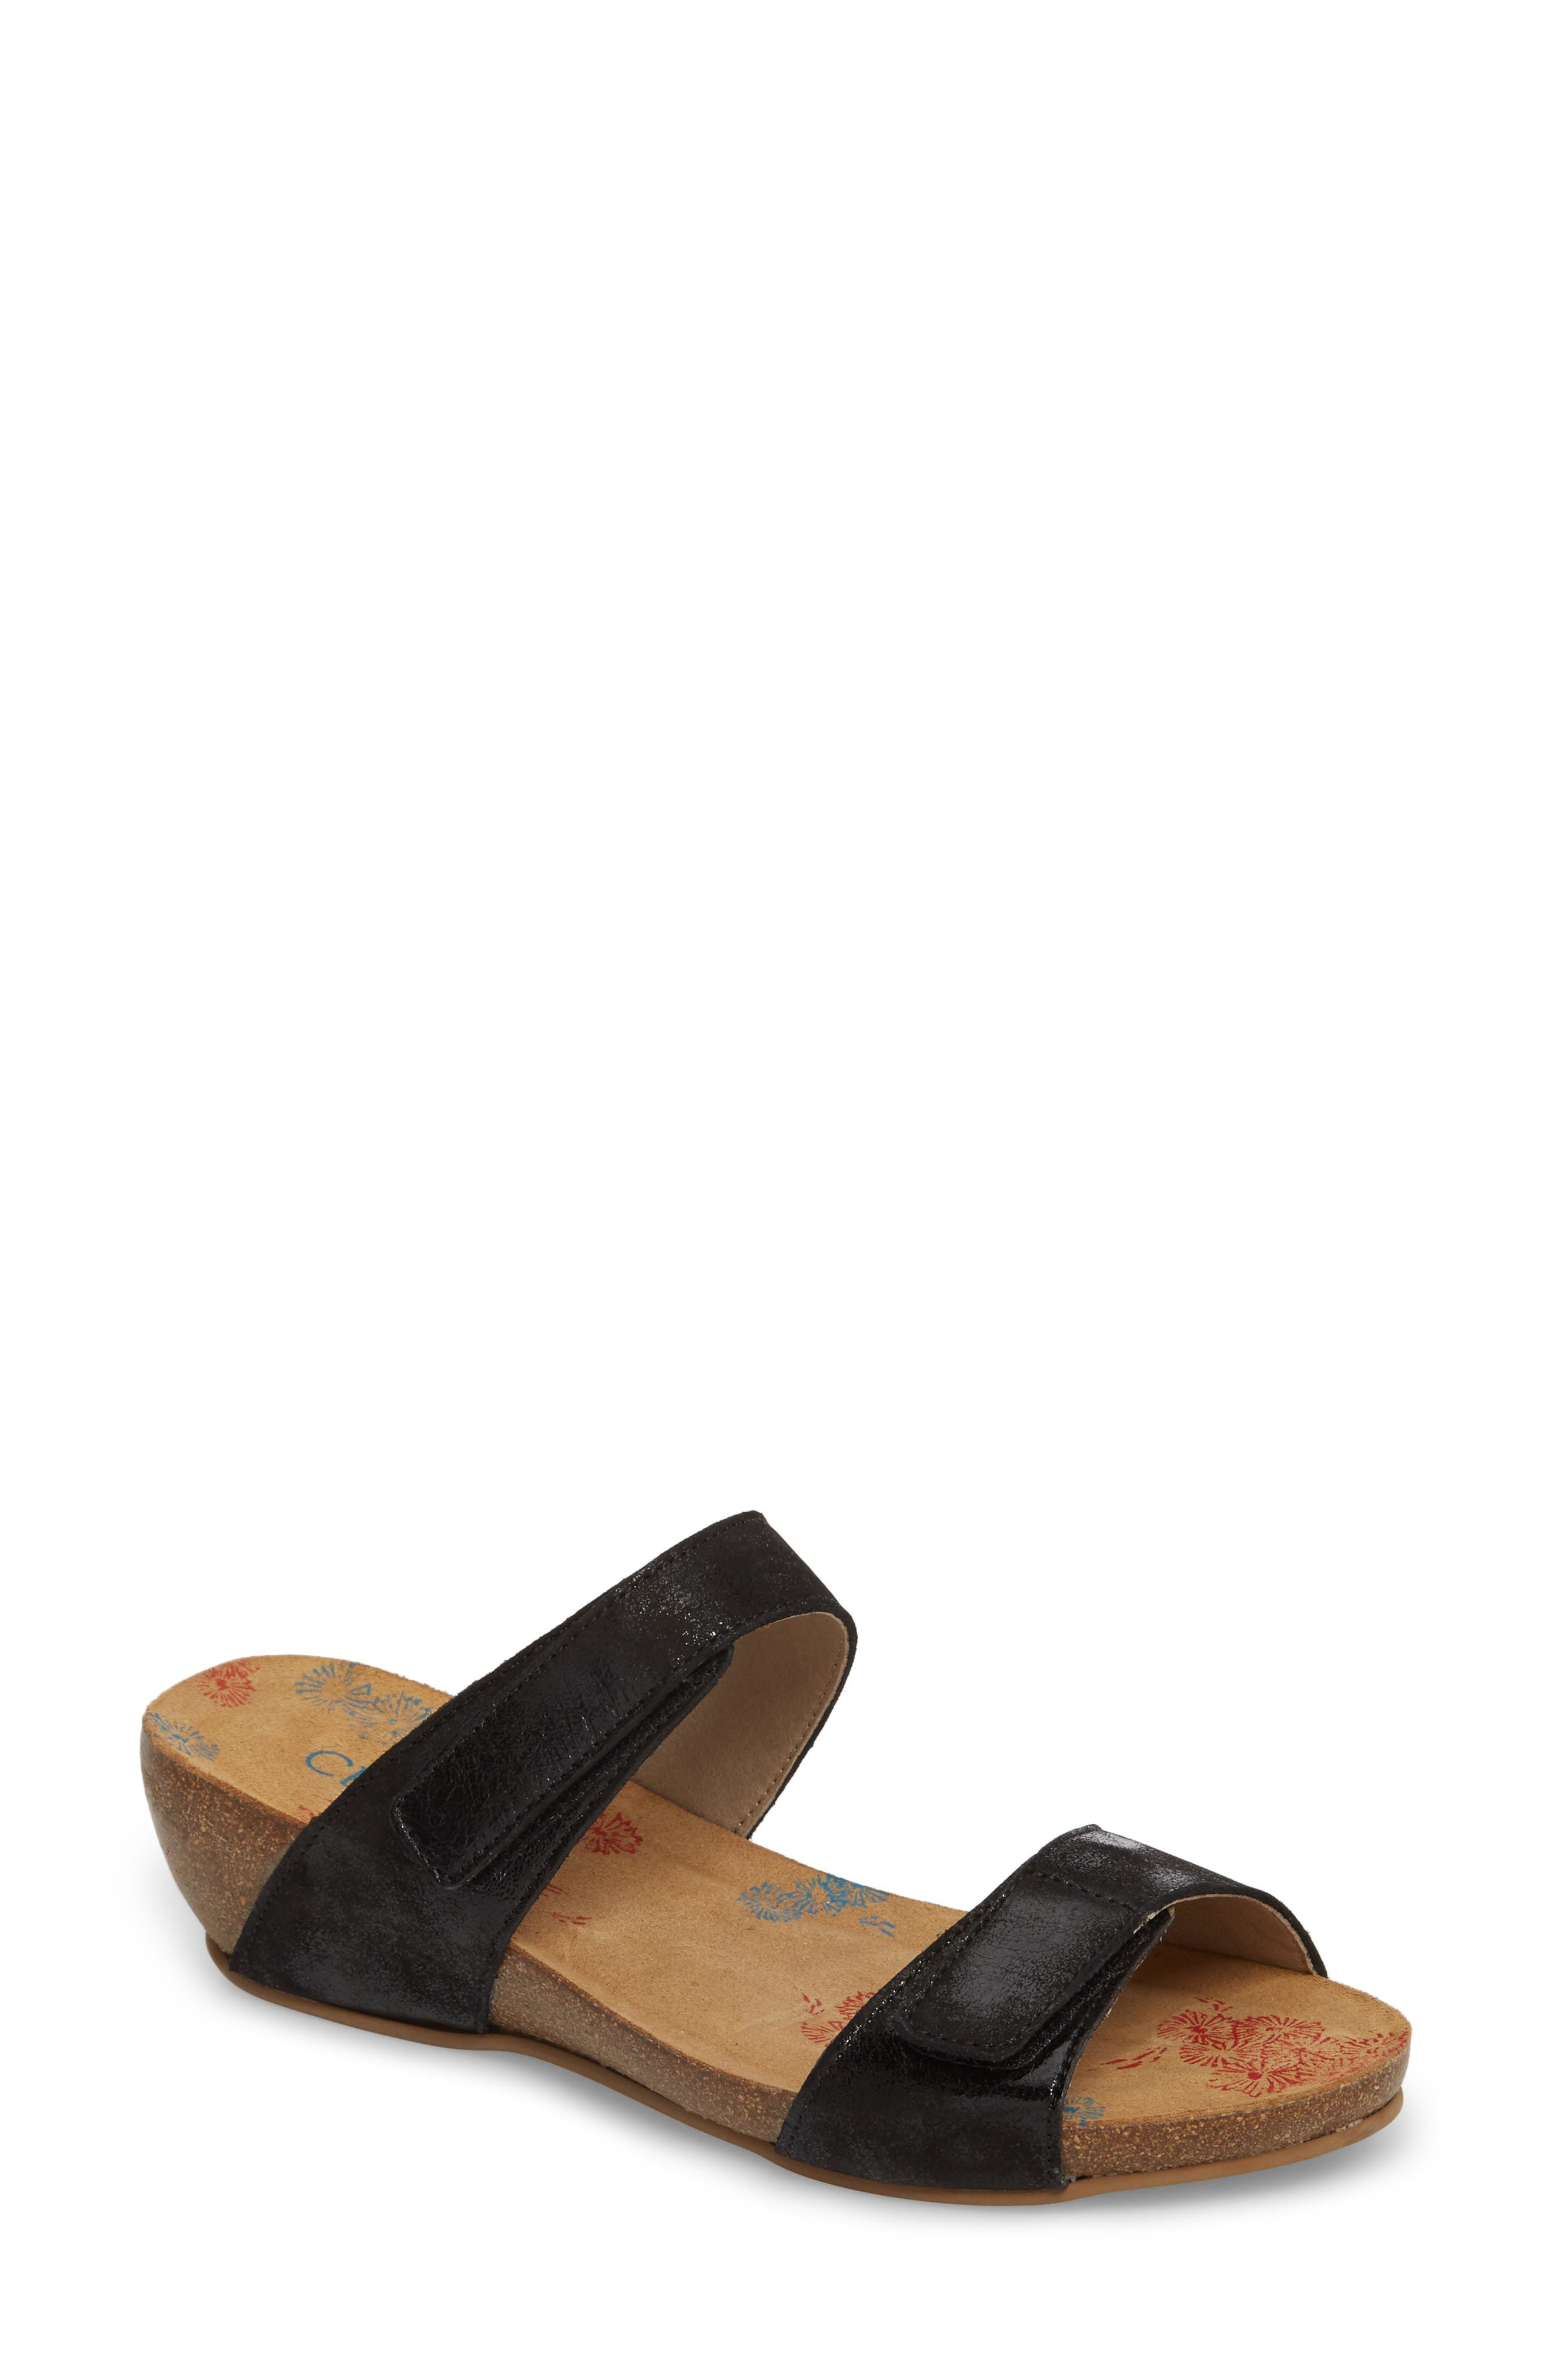 Dawn Wedge Sandal,                         Main,                         color, BLACK STINGER LEATHER